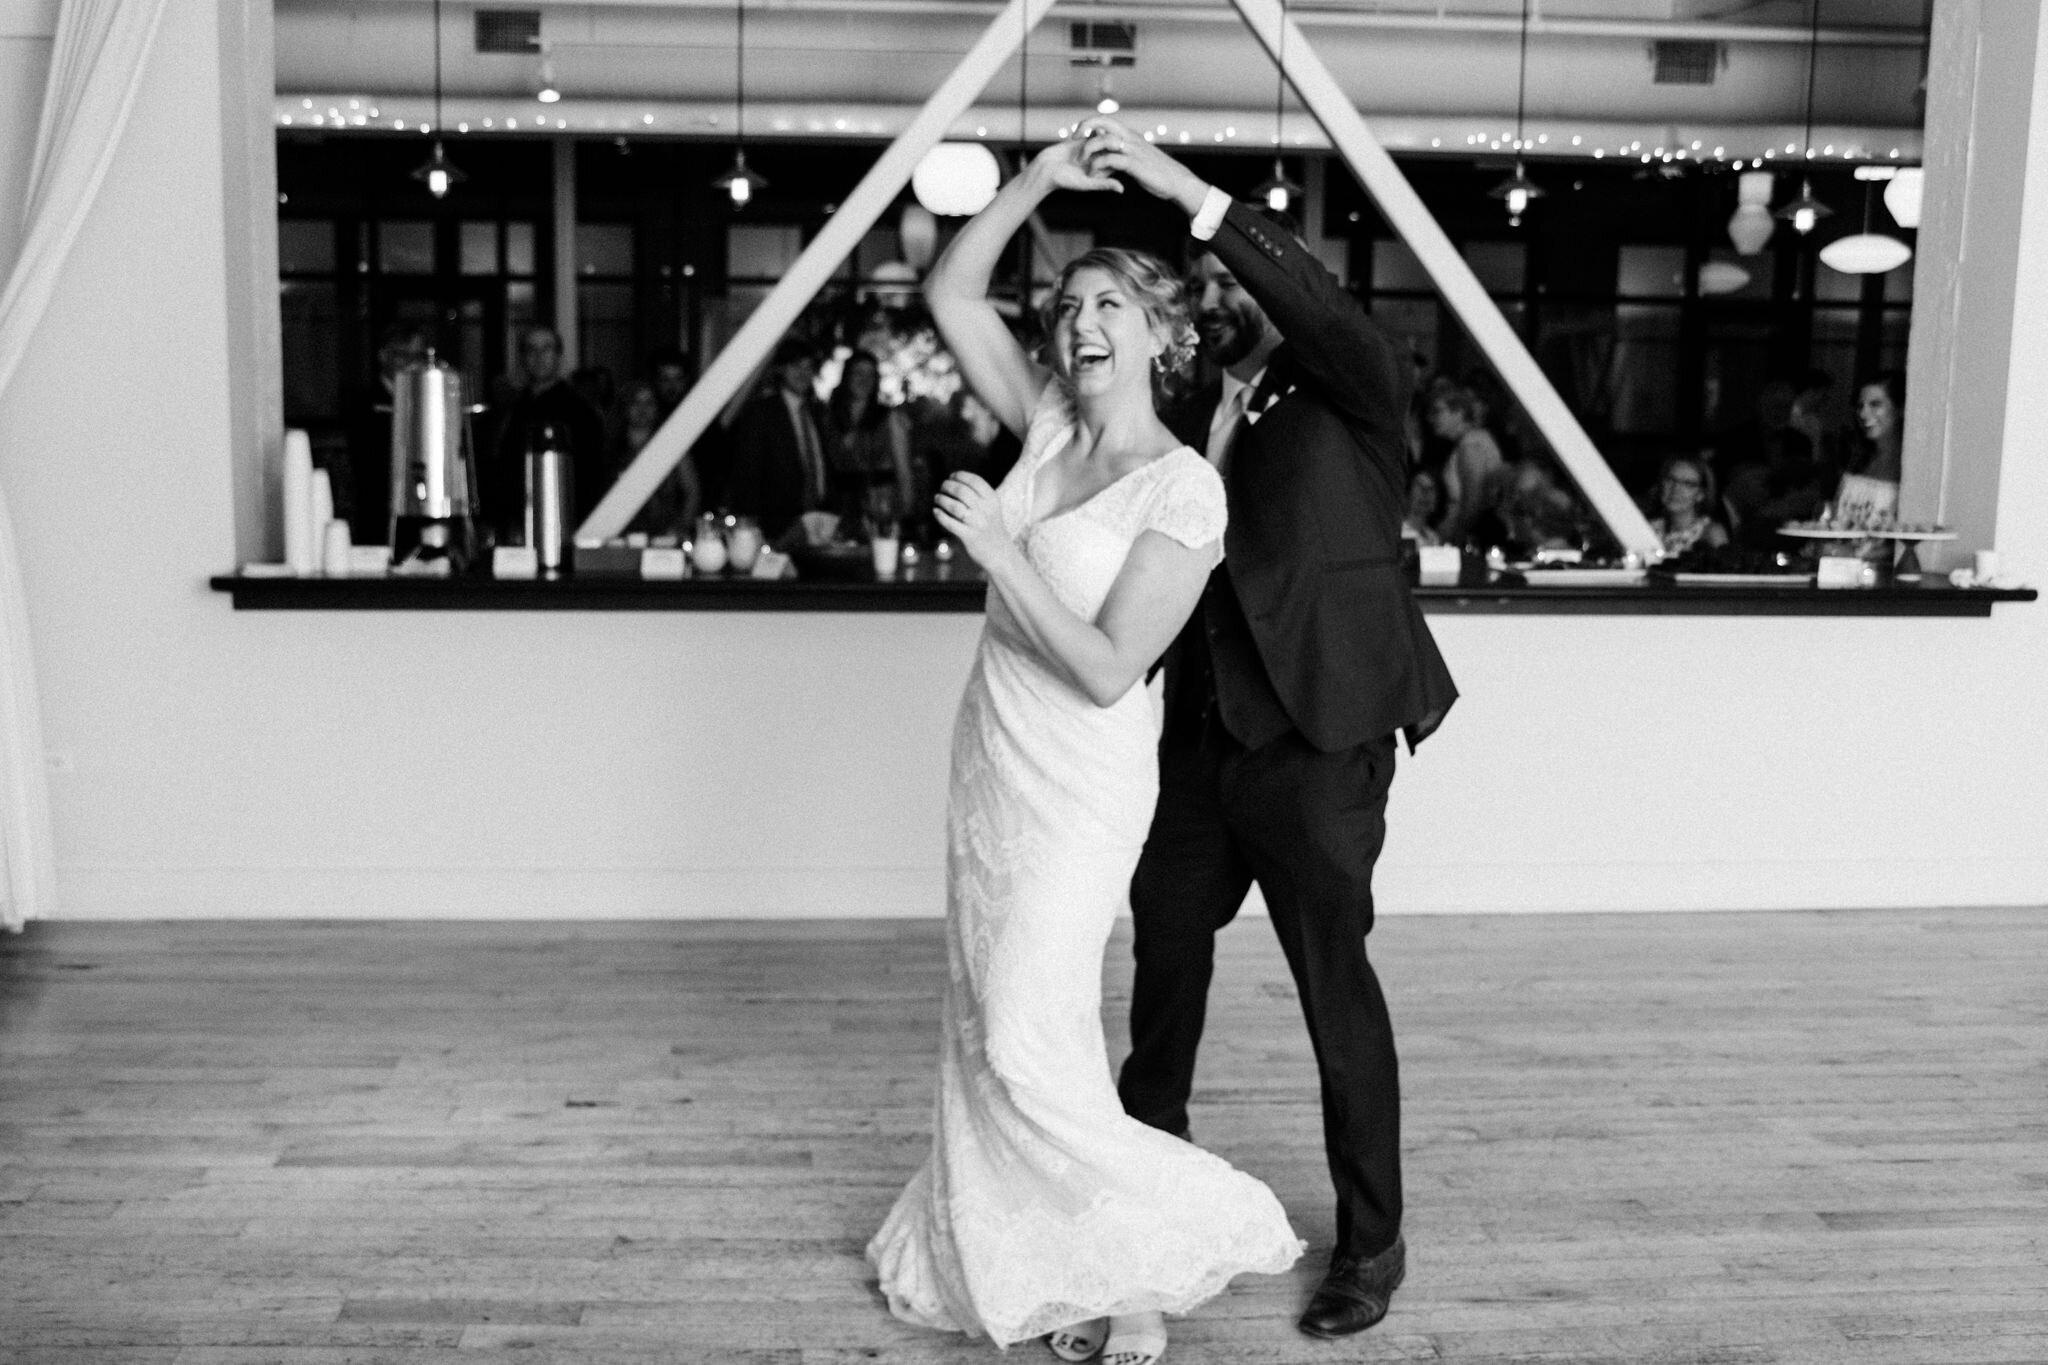 chicago-greenhouse-loft-wedding-dance-rebeccaylasotras-4.jpg